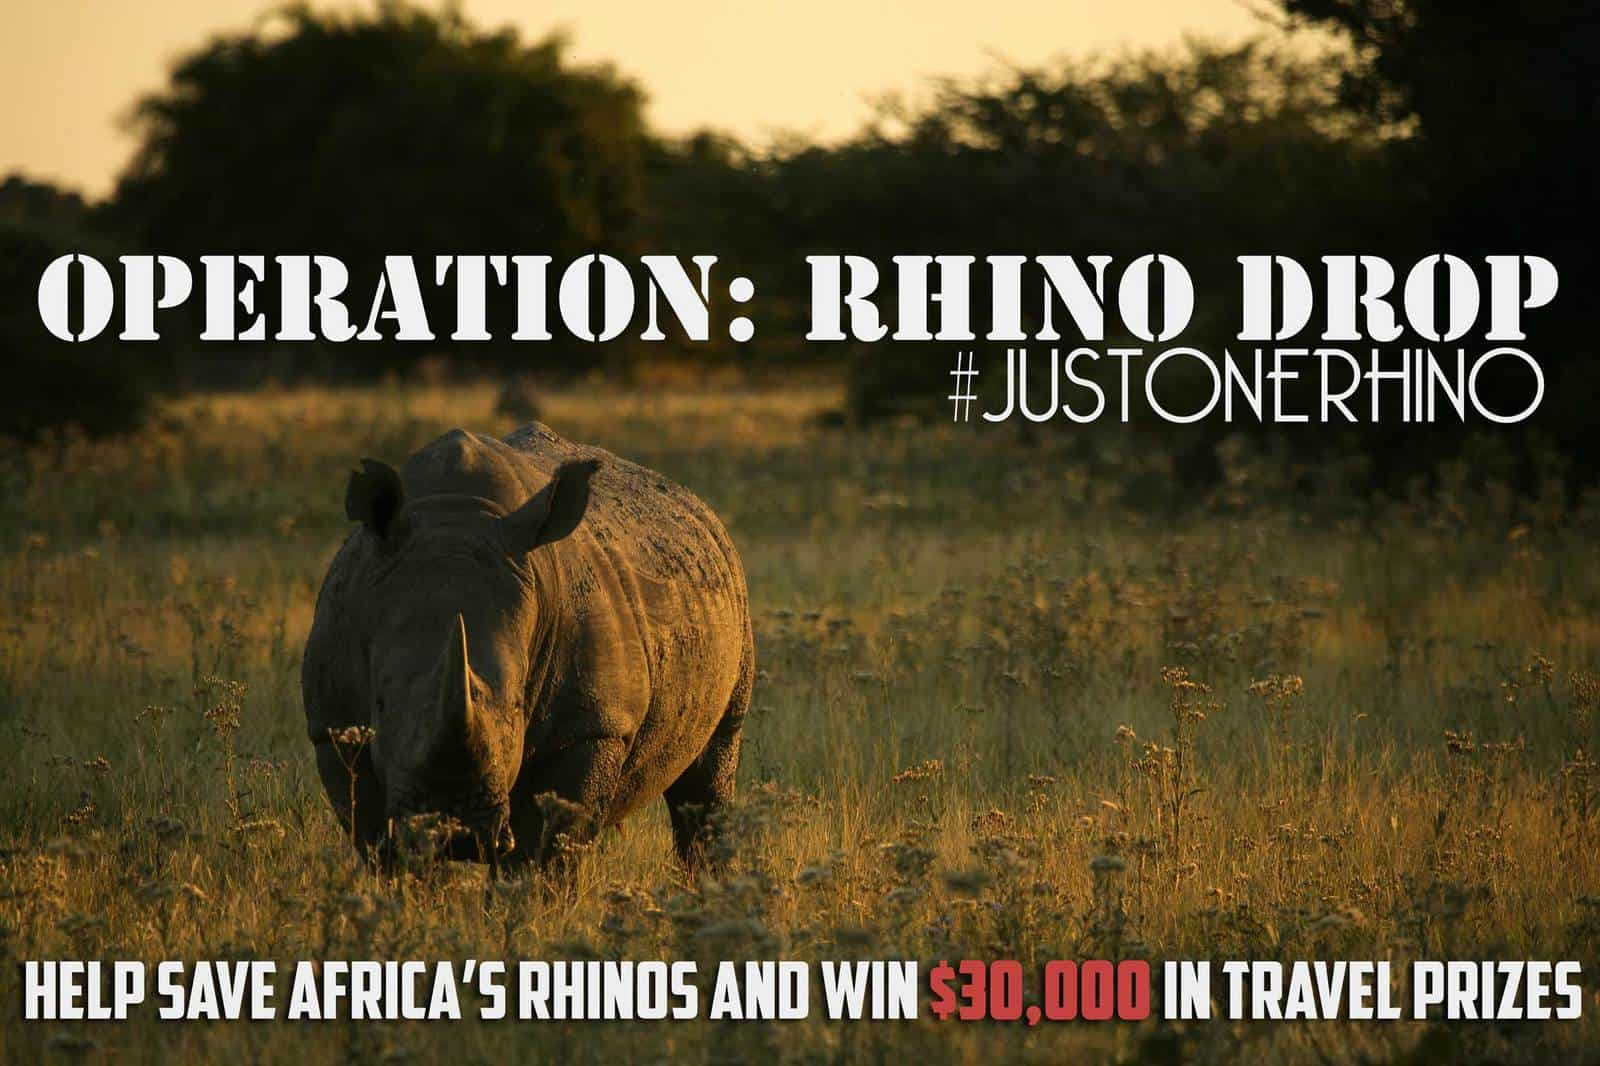 Operation Rhino Drop: Help Save Africa's Rhinos